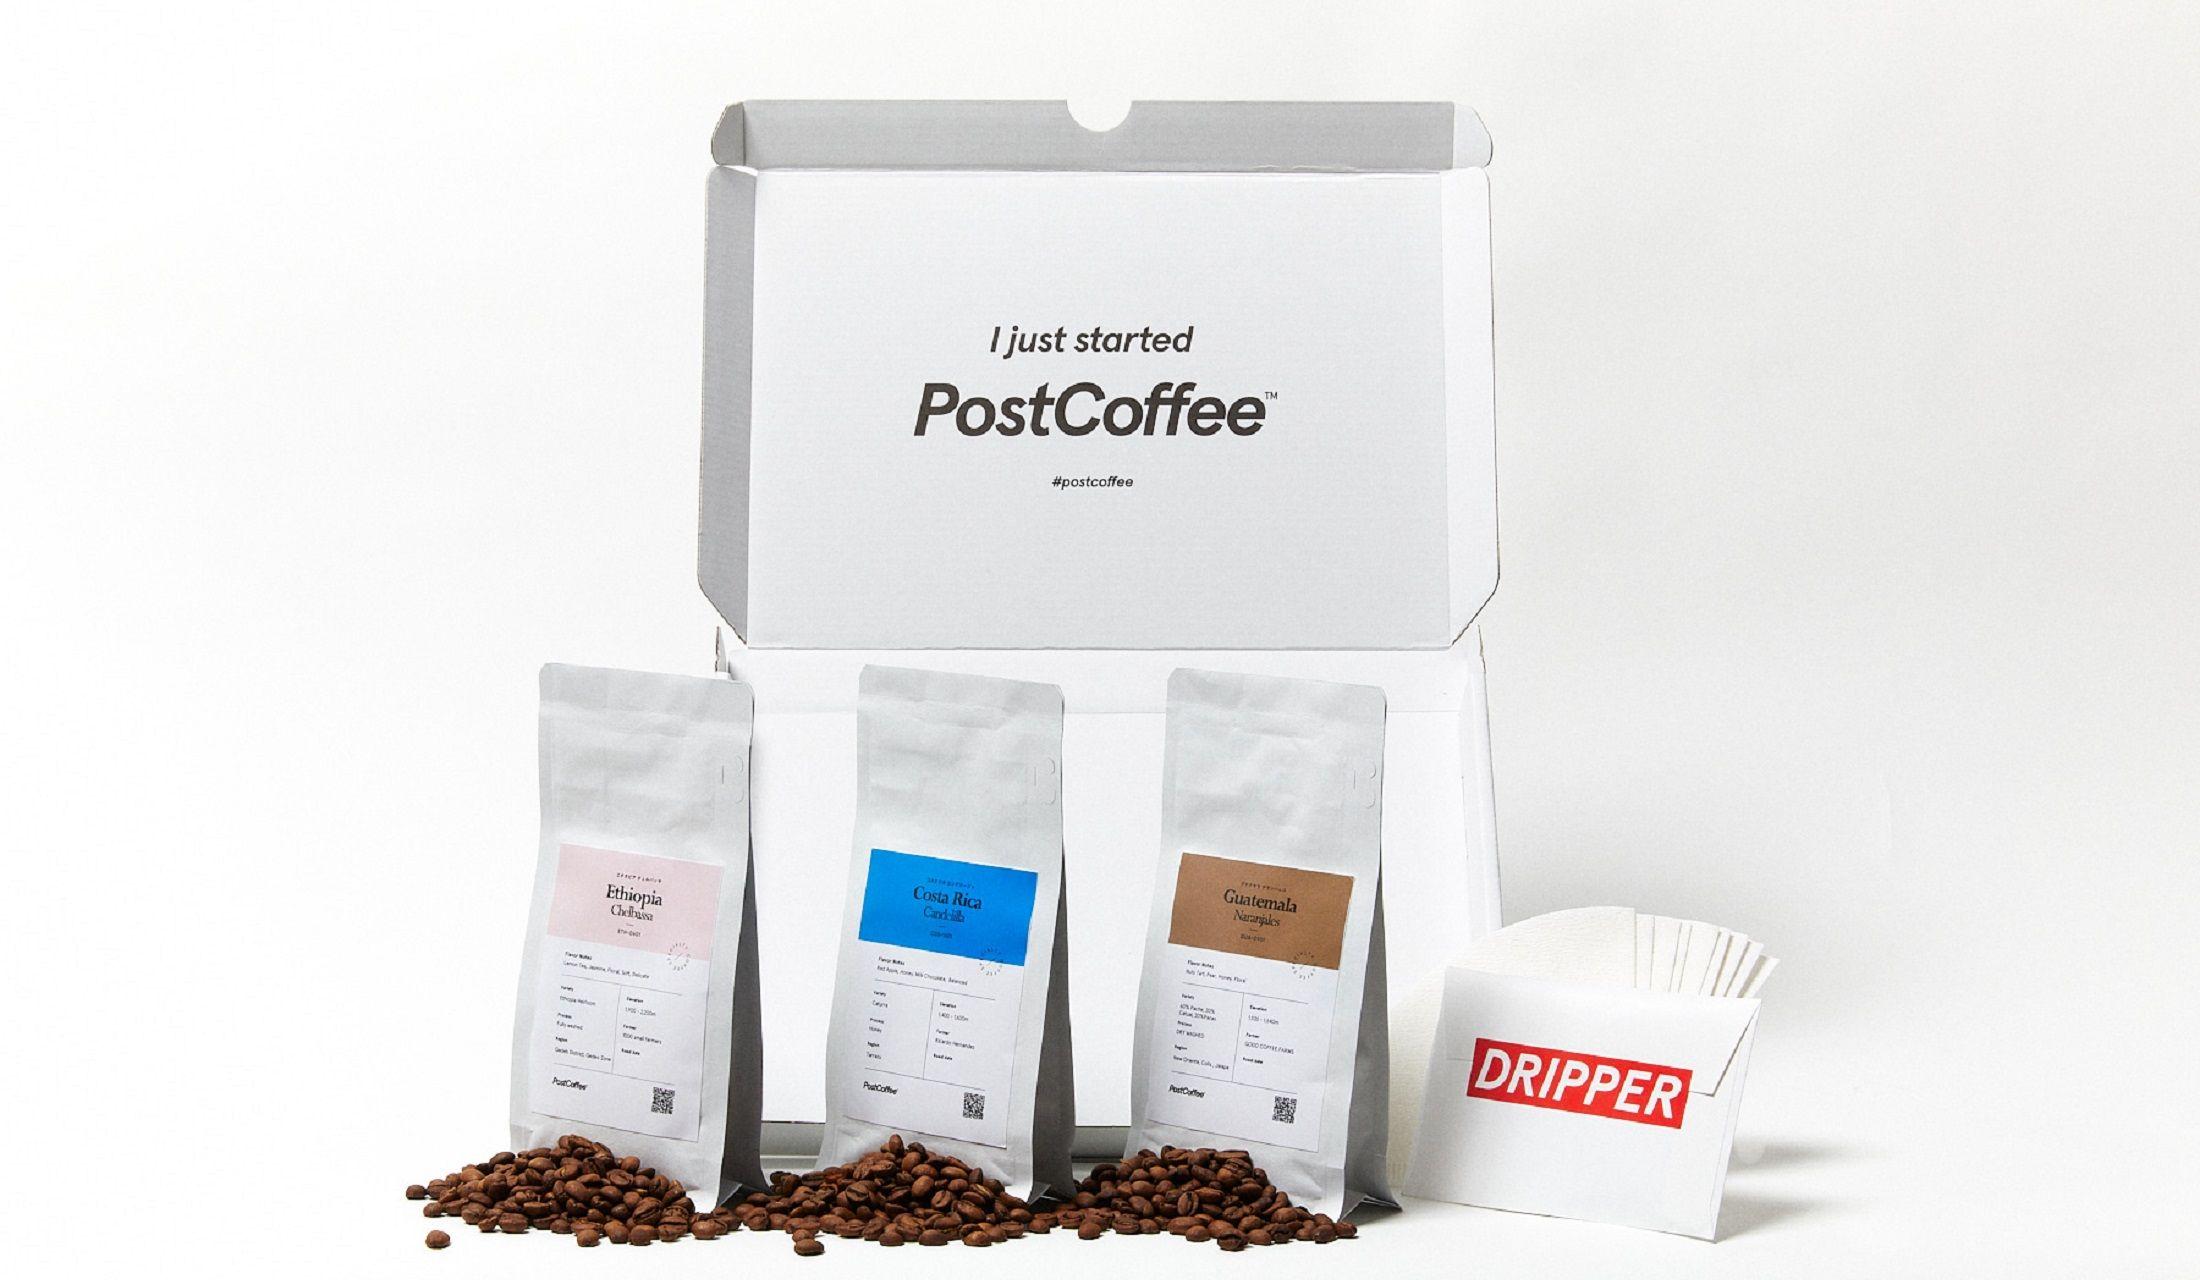 PostCoffee (ポストコーヒー)